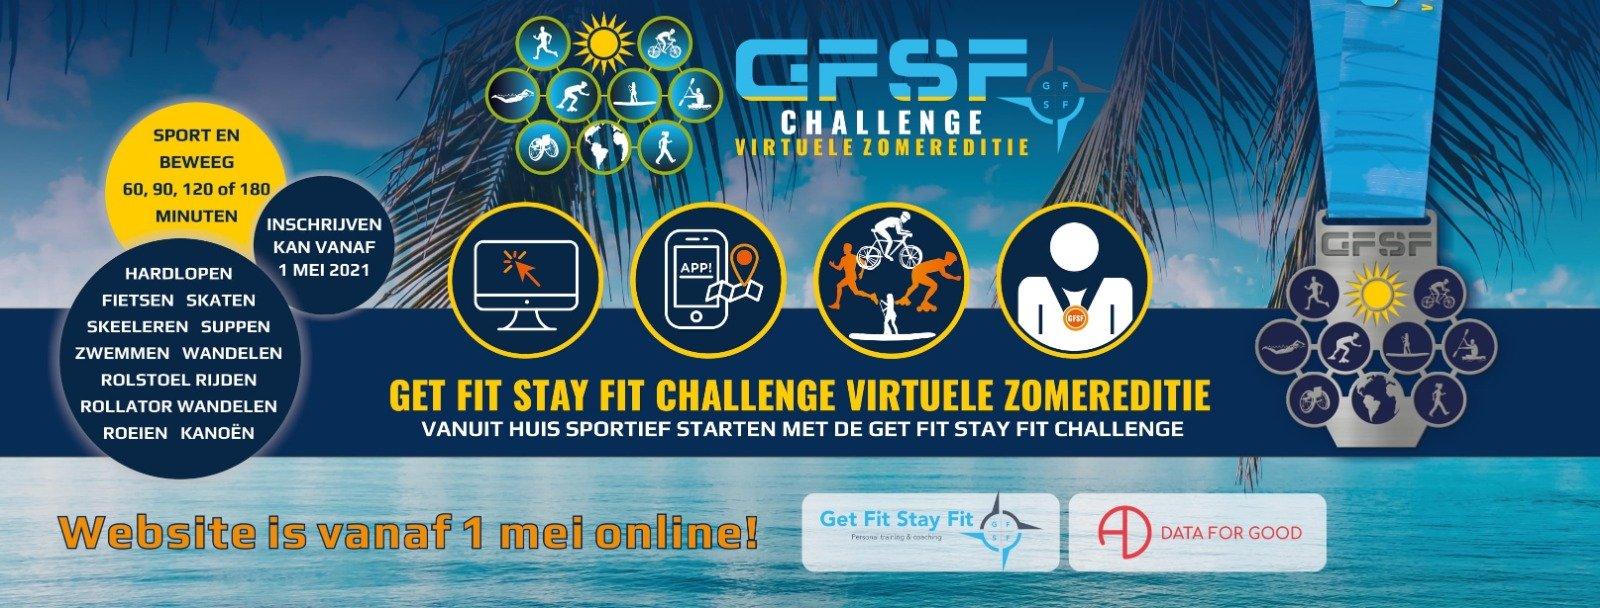 Home GFSF Challenge